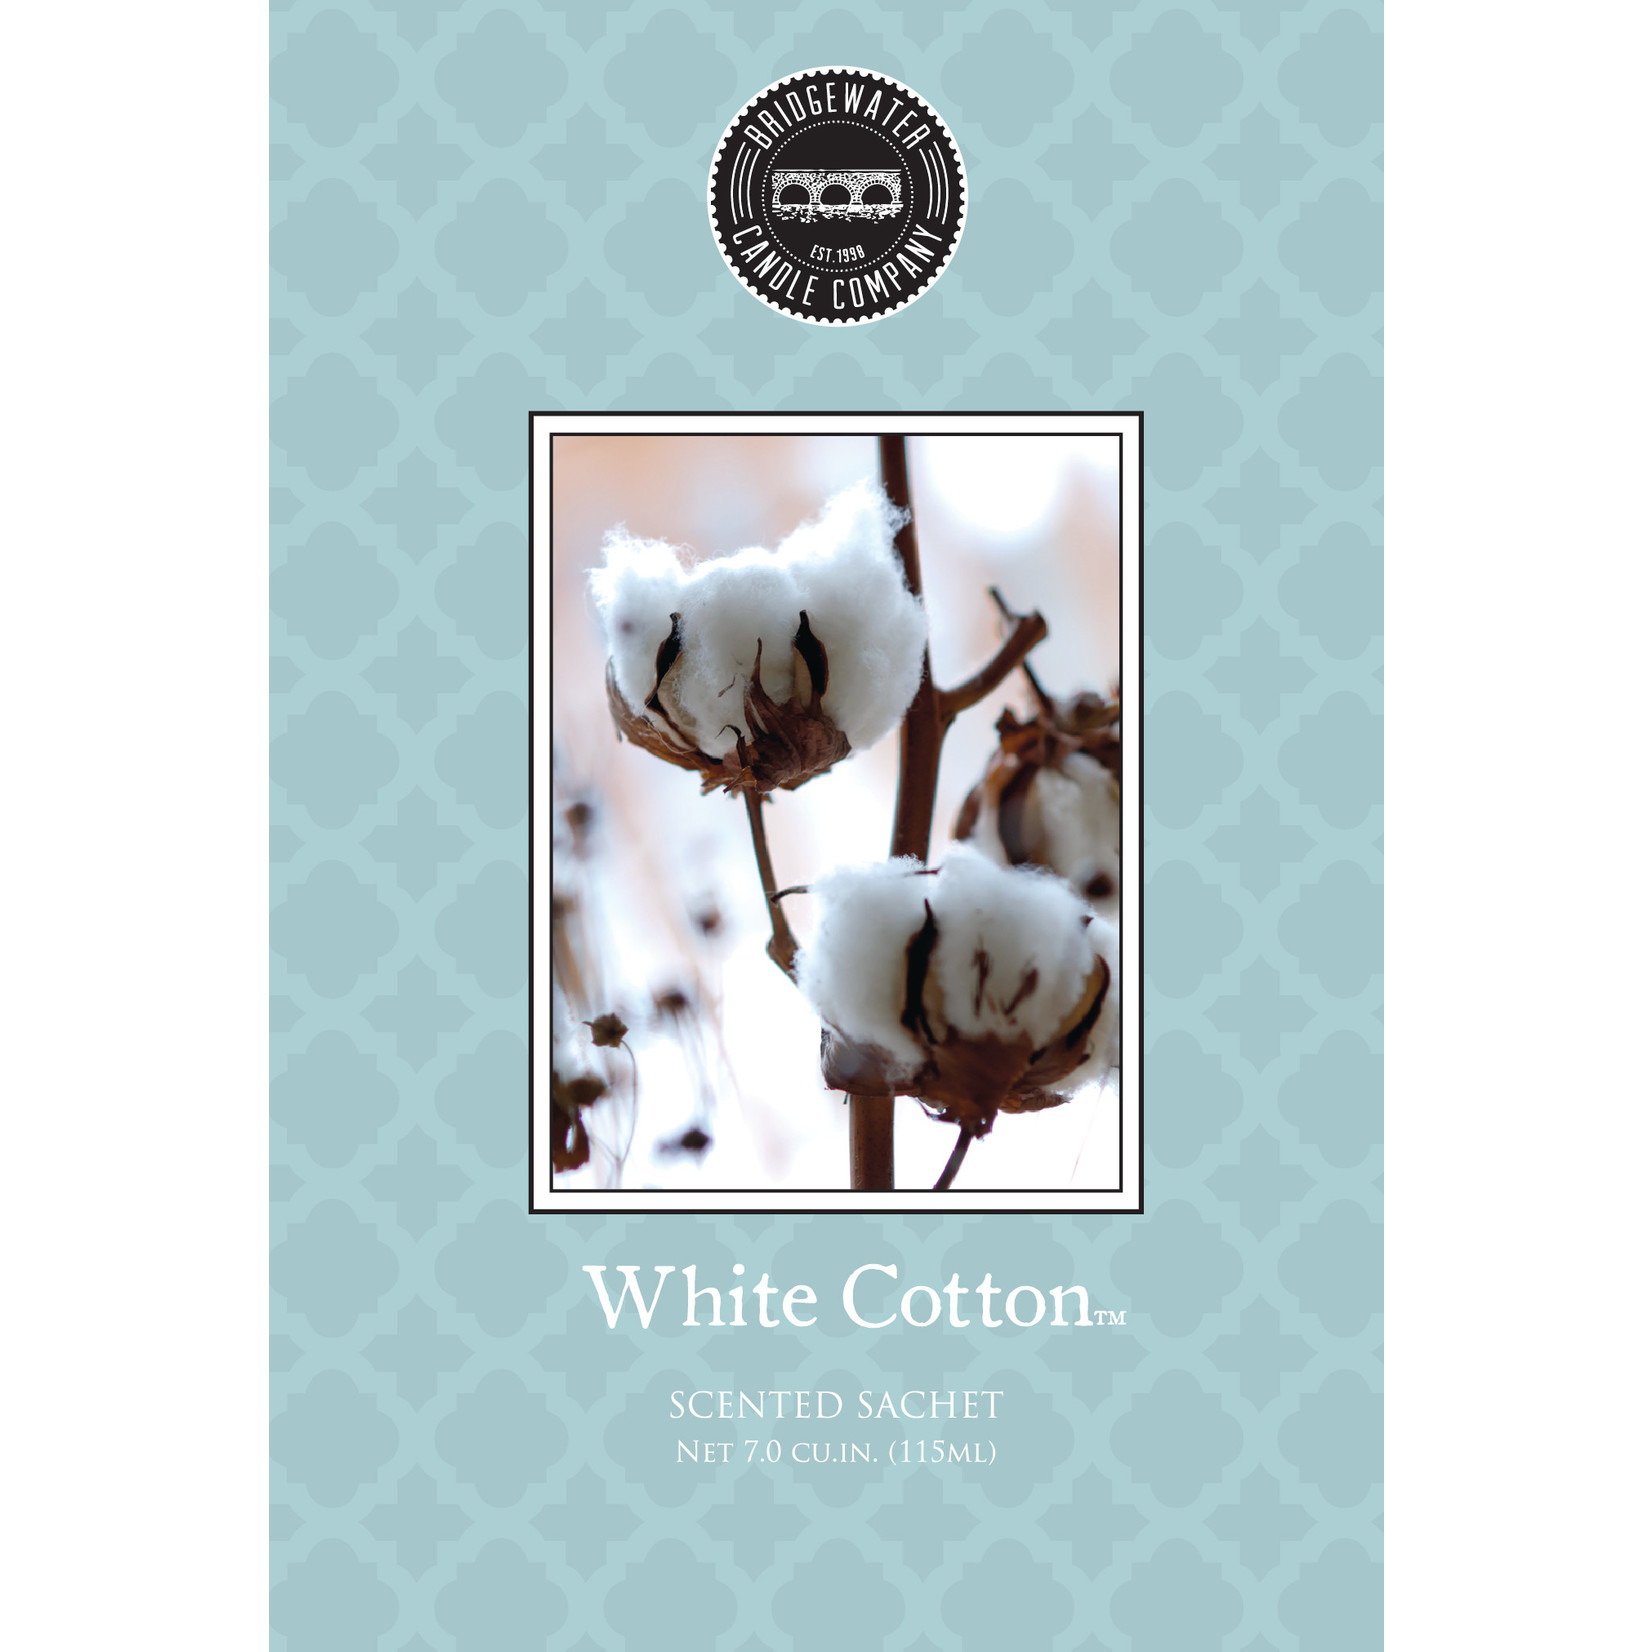 Bridgewater Scented Sachet / Geurzakje White Cotton